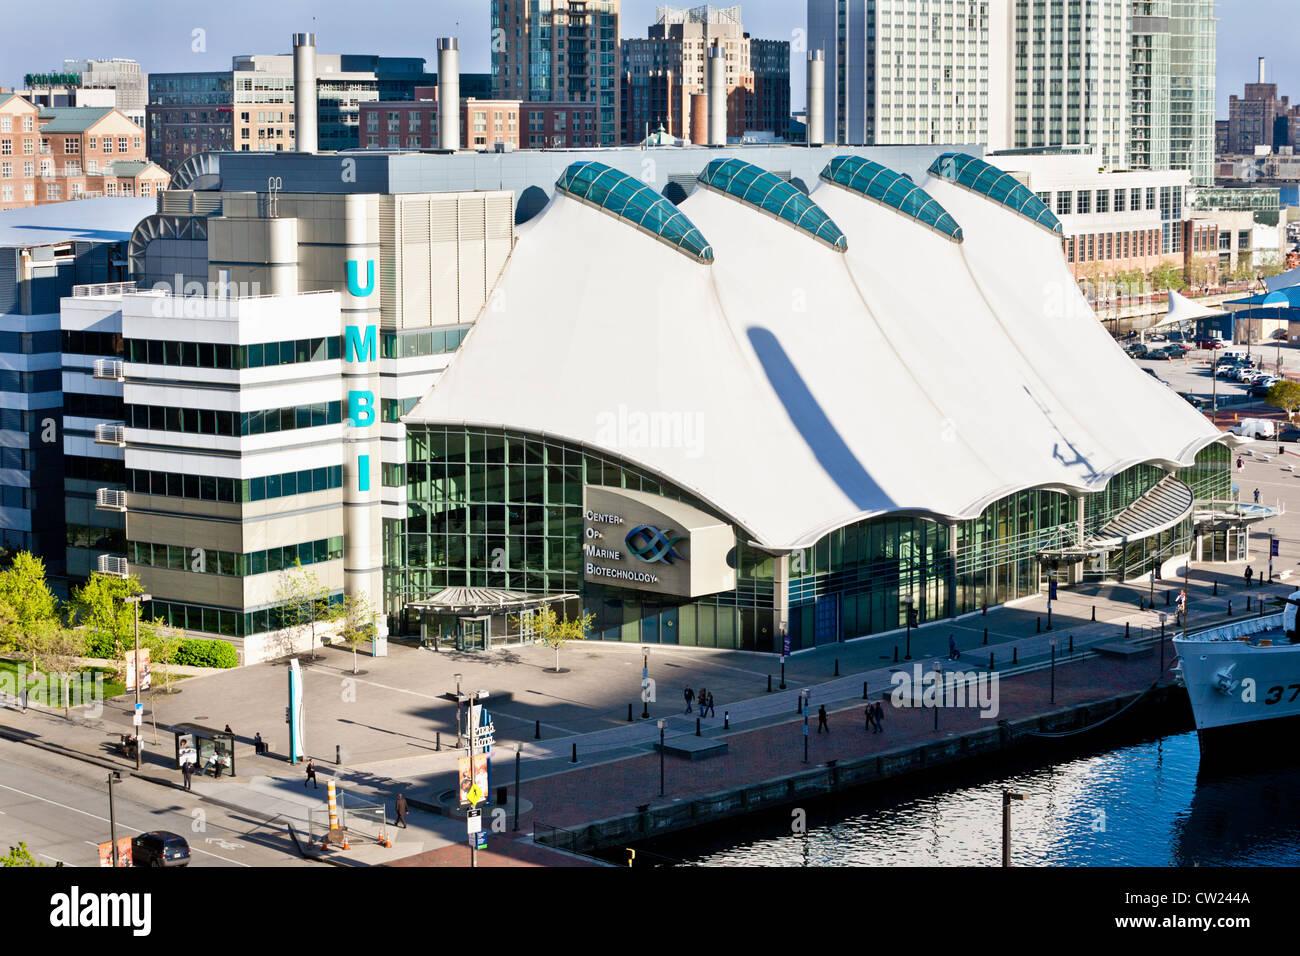 Columbus Center of Marine Biotechnology, Baltimore, Maryland - Stock Image